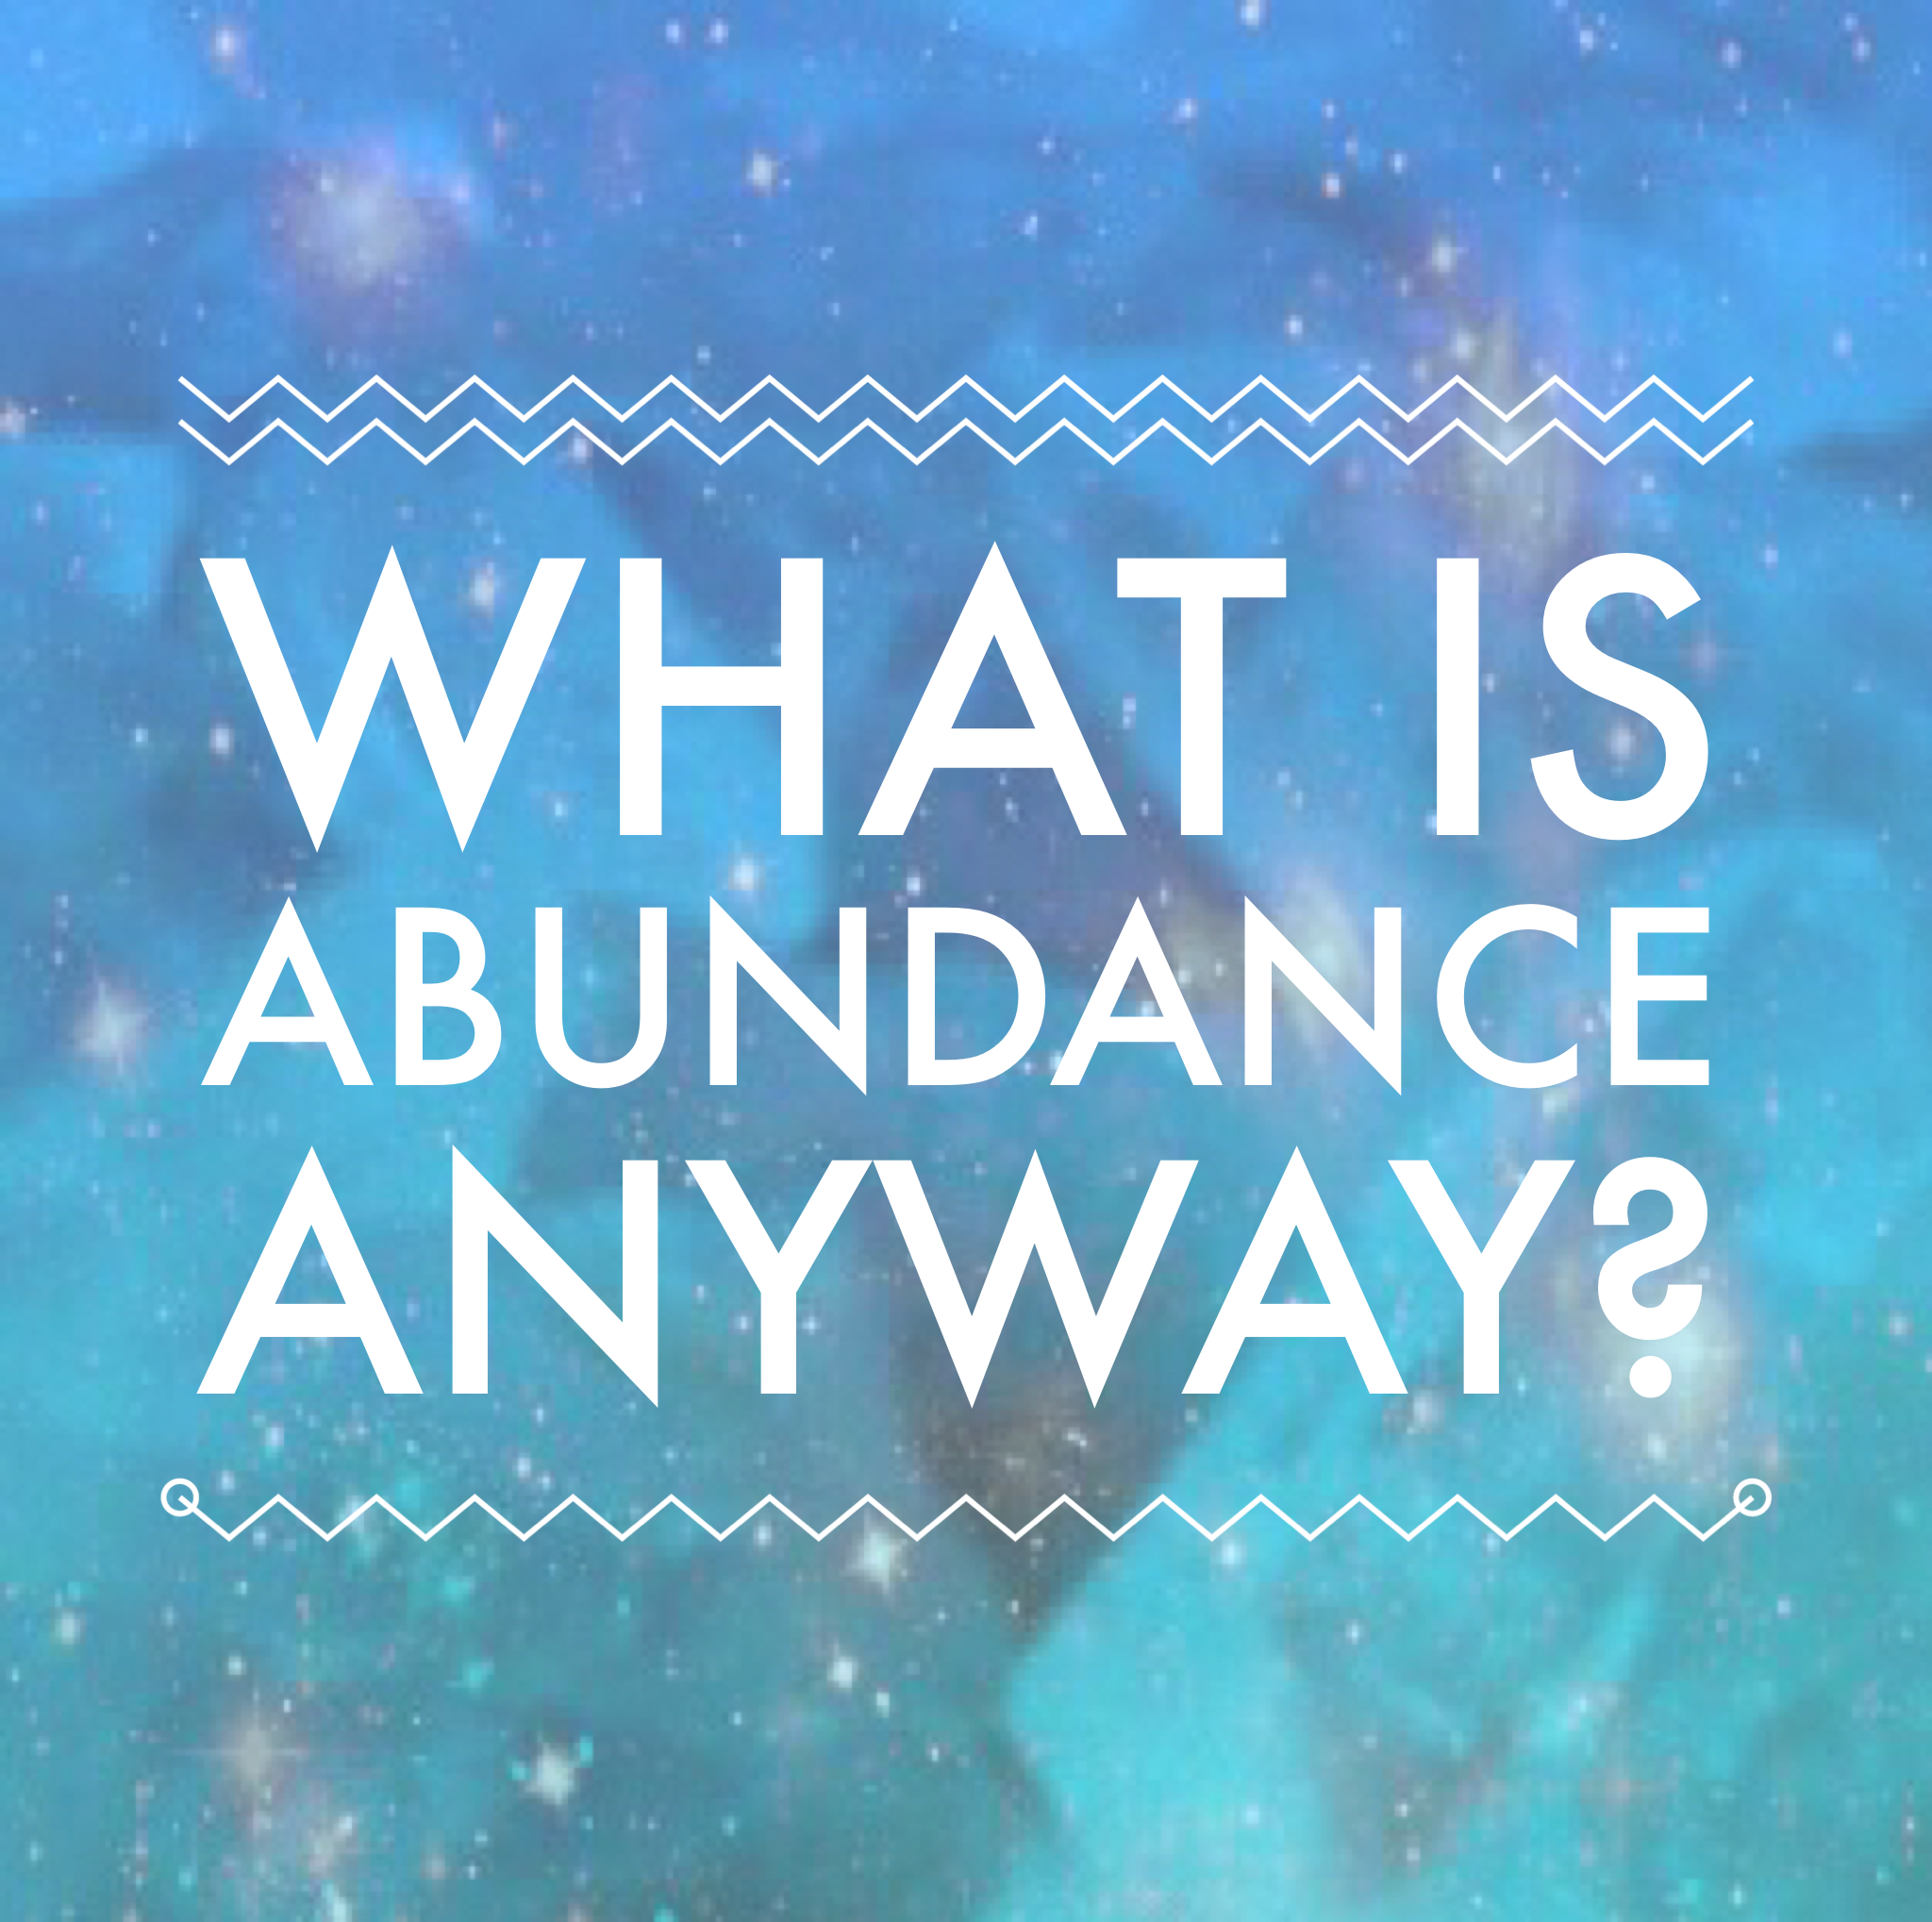 What is abundance anyway?